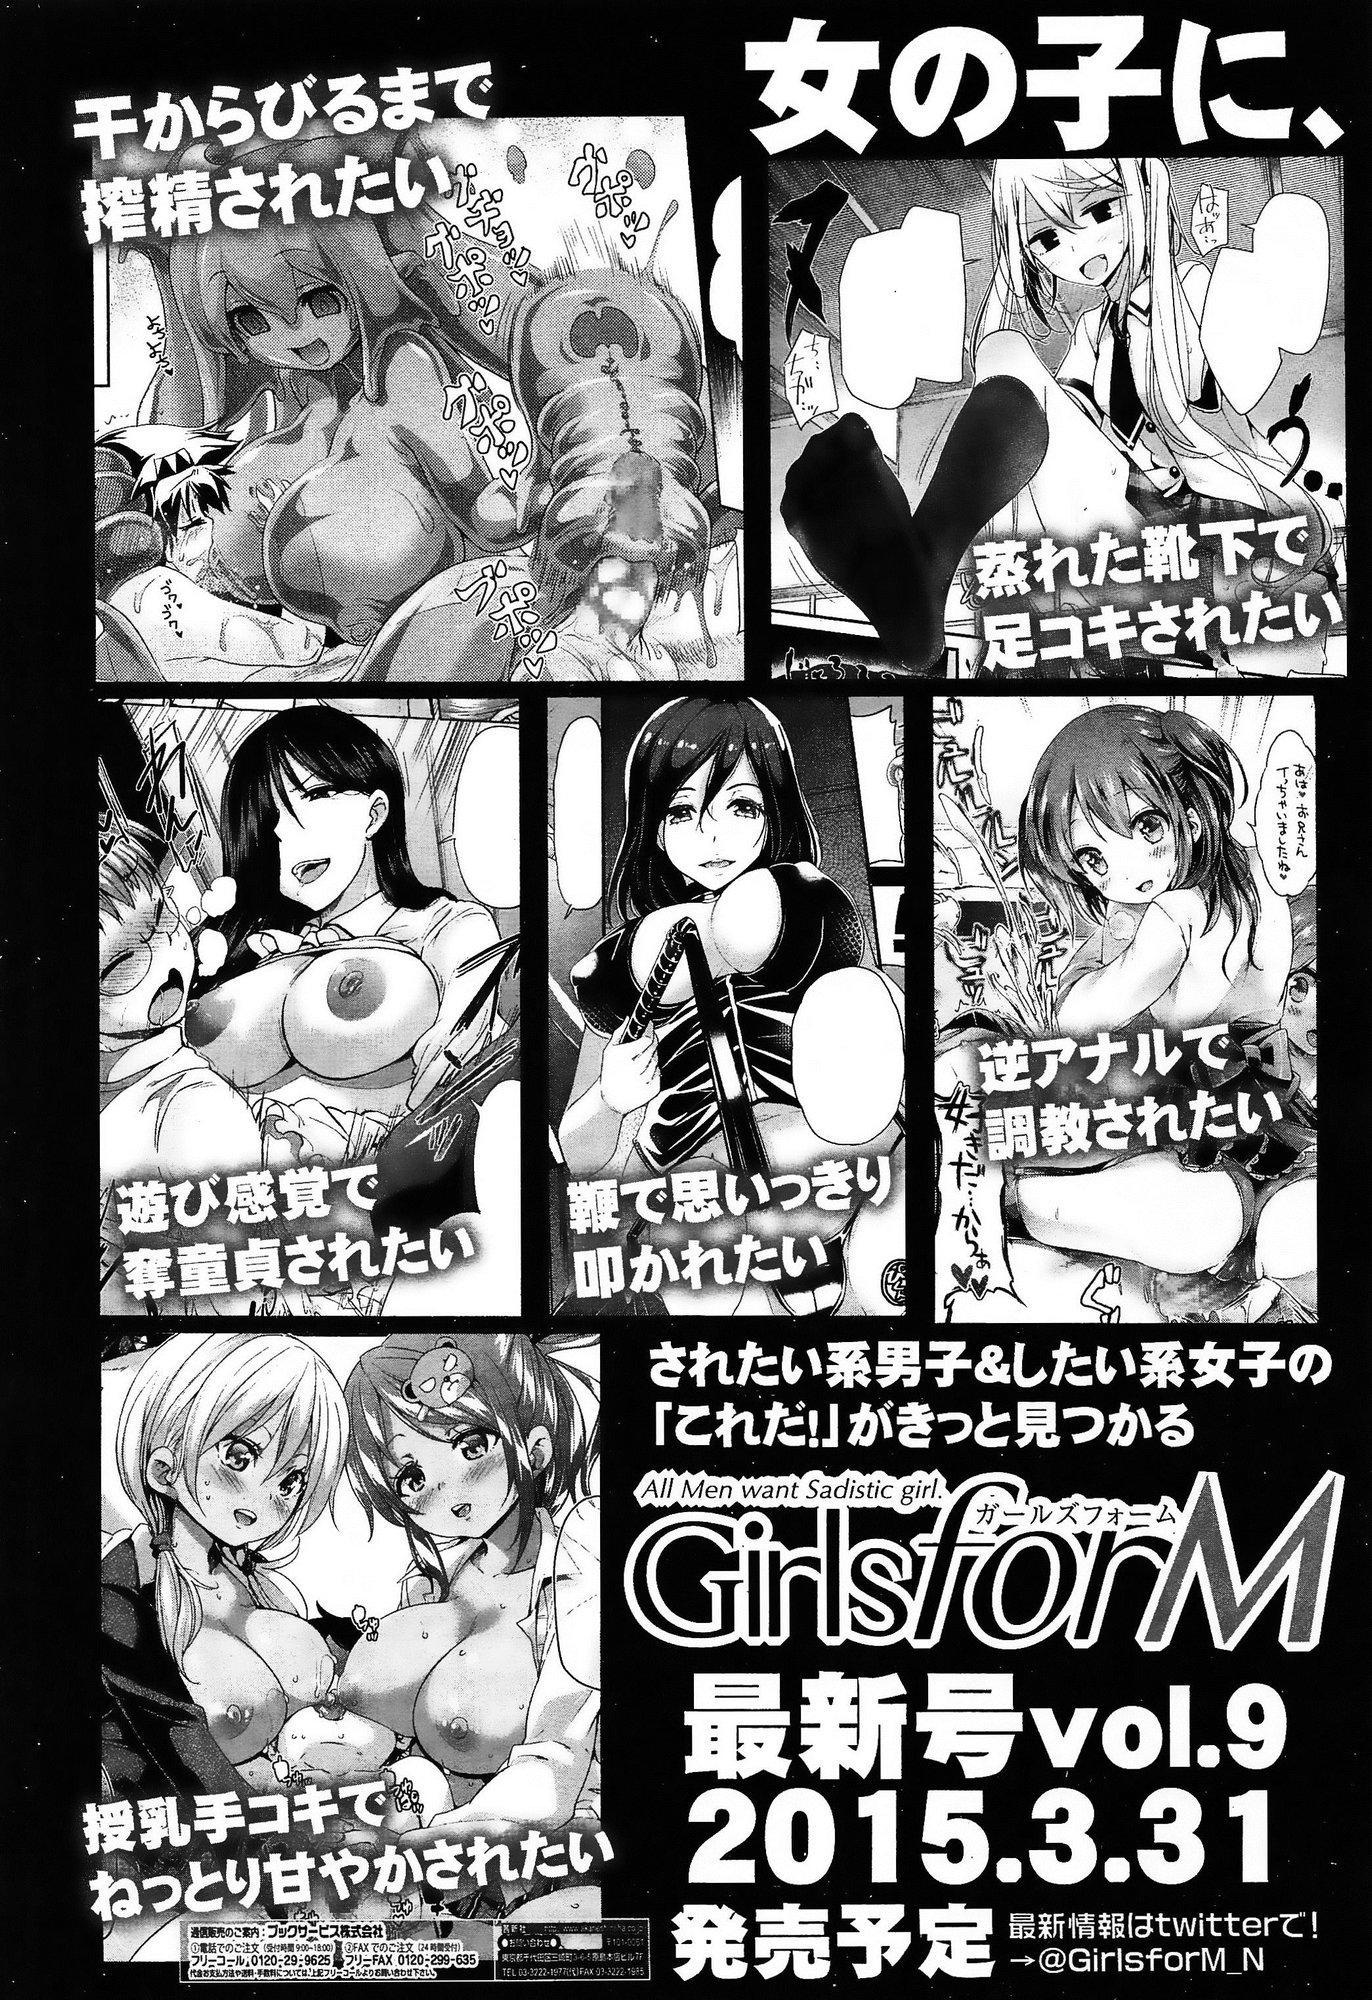 Comic Koh Vol.3 443